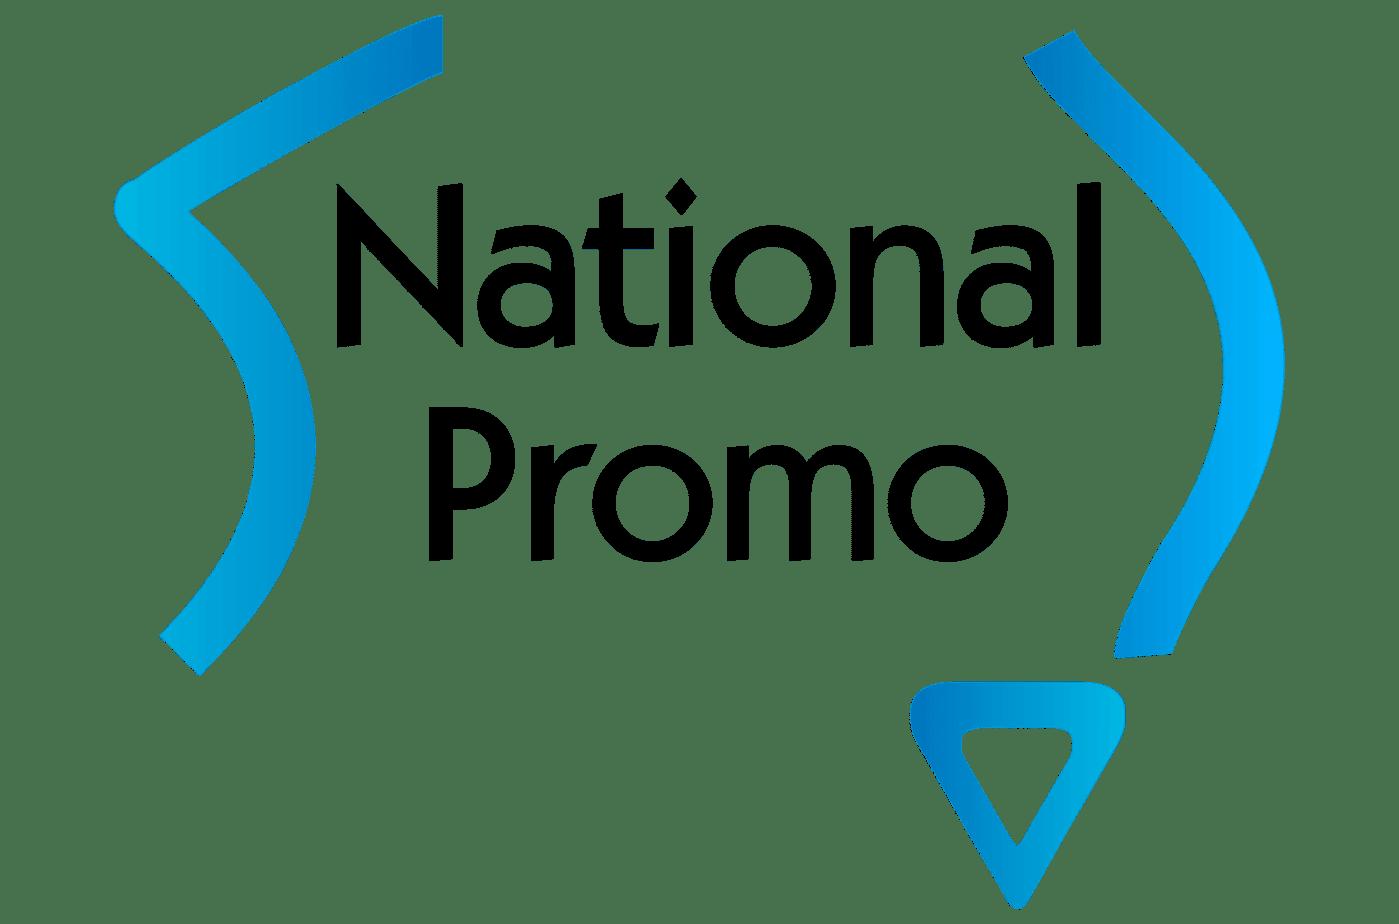 National Promo